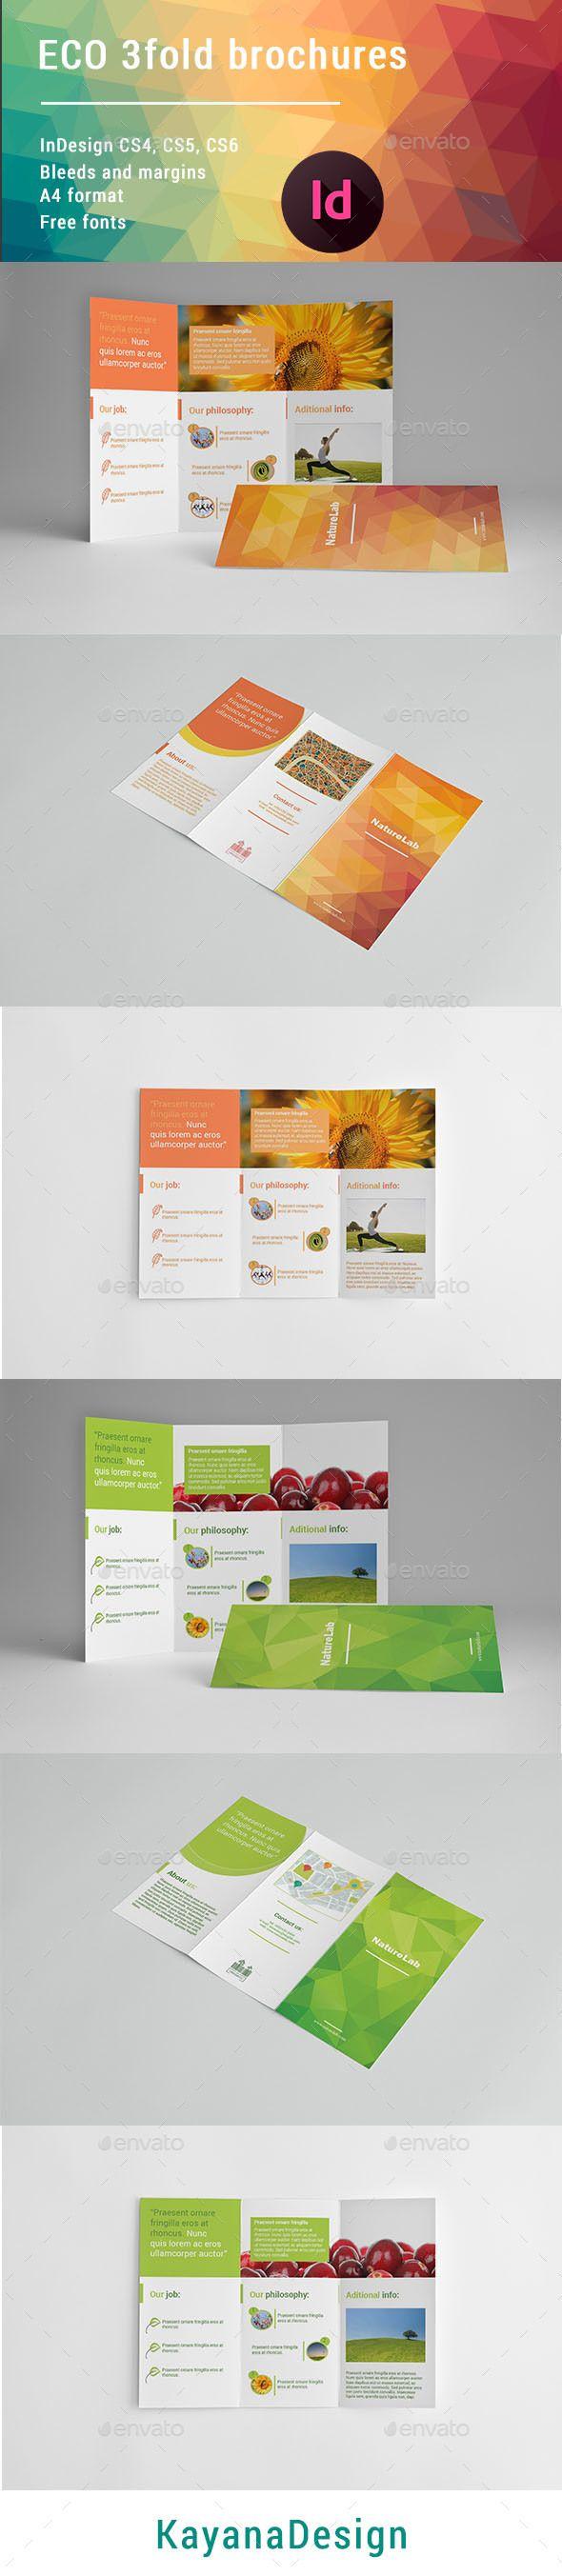 Eco 3 Fold #Brochures - Brochures Print Templates Download here: https://graphicriver.net/item/eco-3-fold-brochures/19693938?ref=alena994